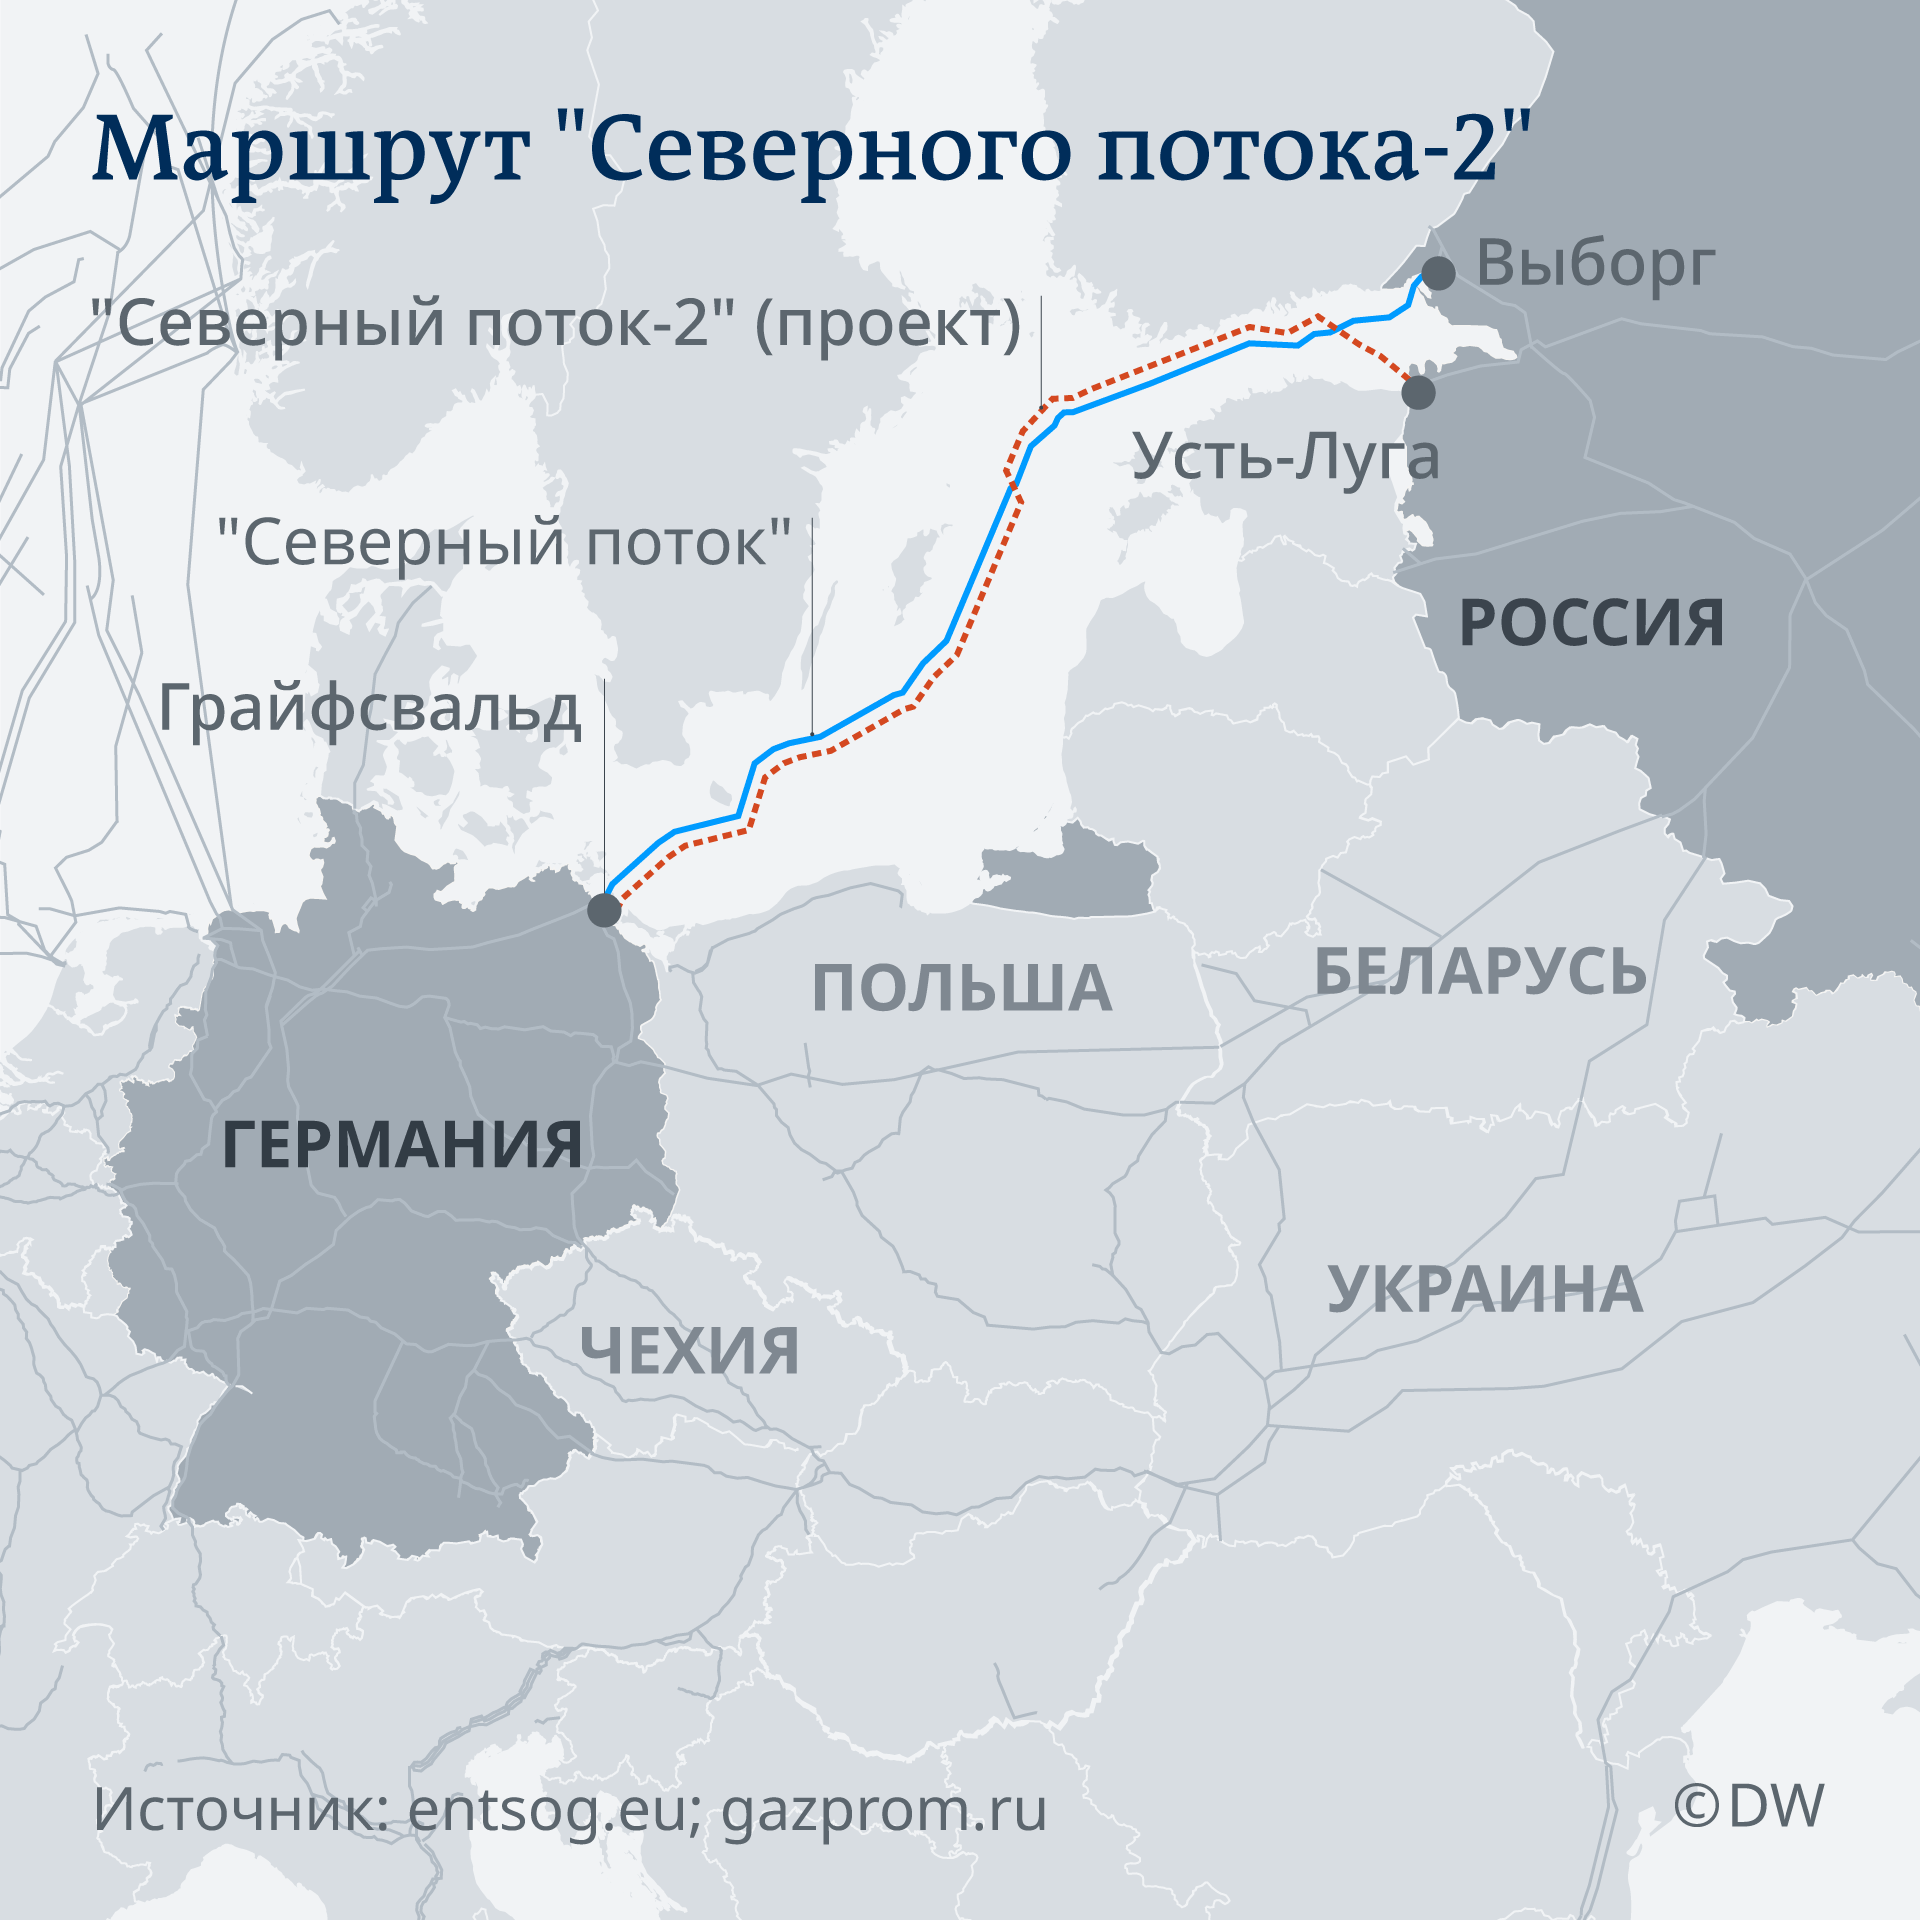 Инфографика Маршрут Северного потока-2